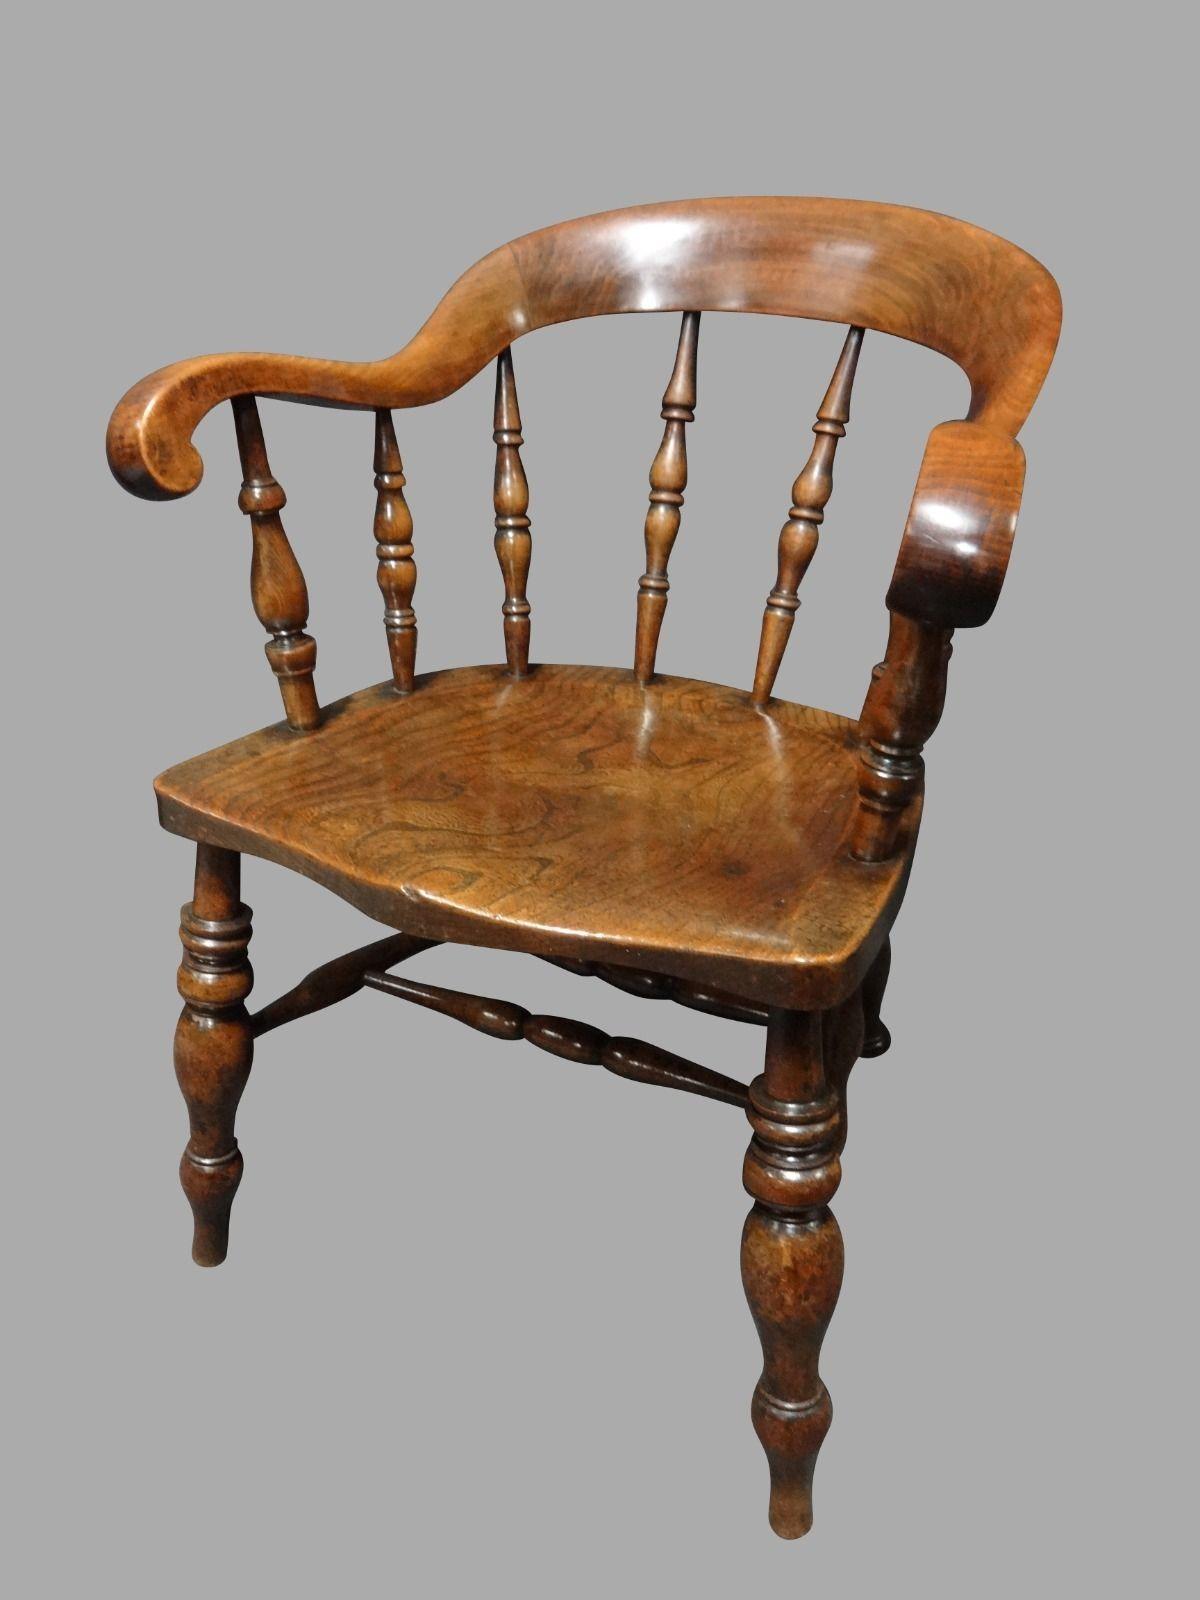 Good Victorian Elm Desk Chair Vintage Desk Chair Antique Desk Chair Victorian Chair